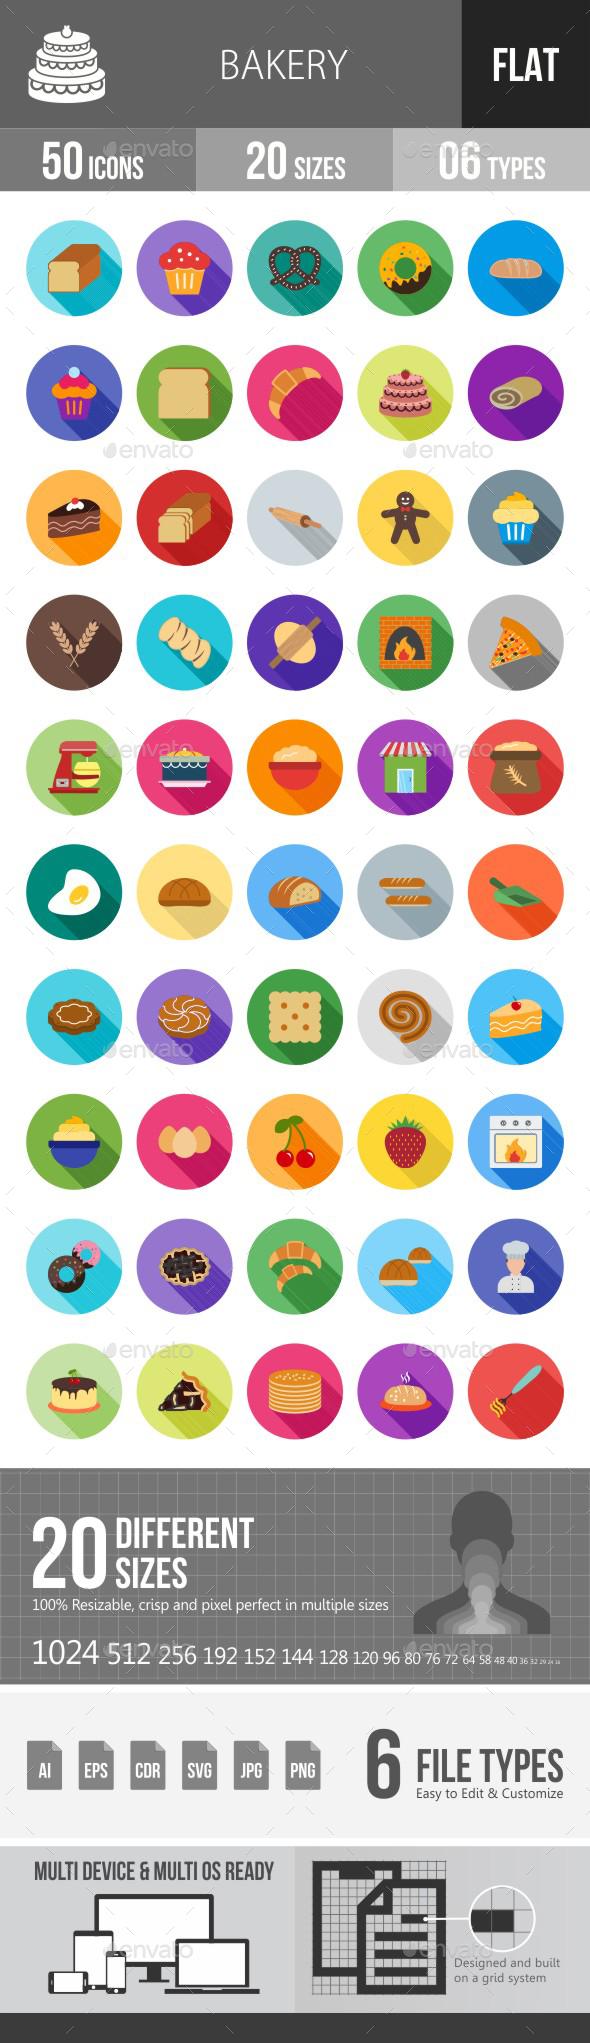 Bakery Flat Shadowed Icons - Icons